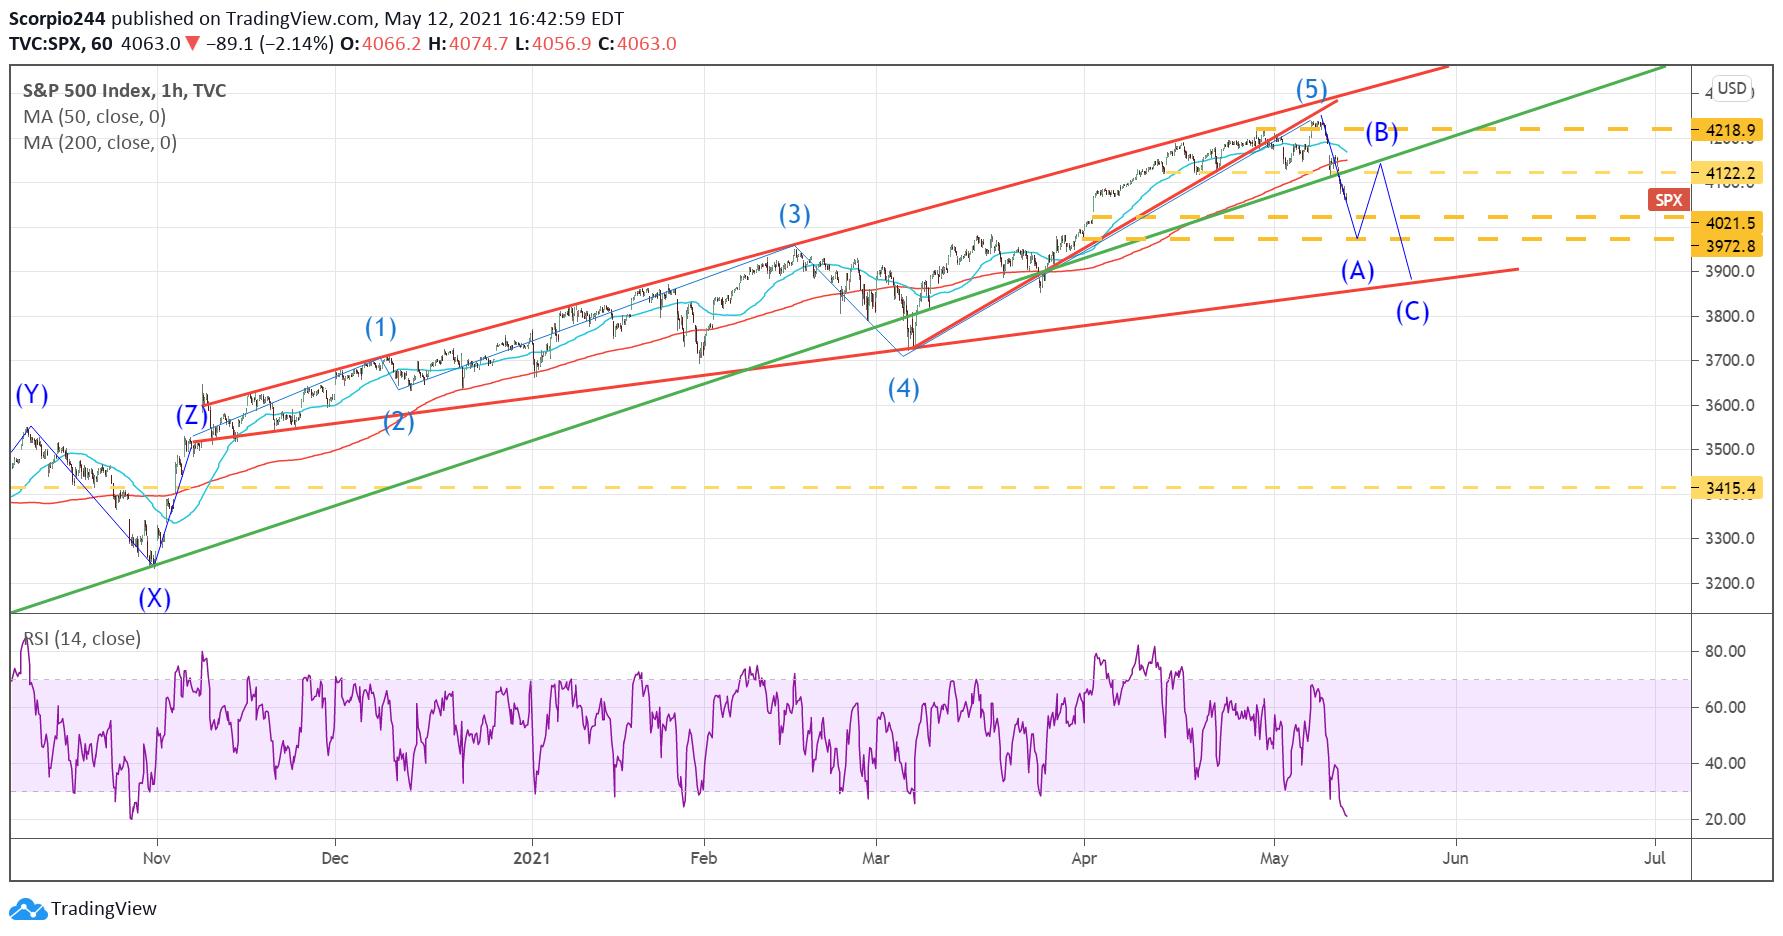 S&P 500 Index 1 Hr Chart